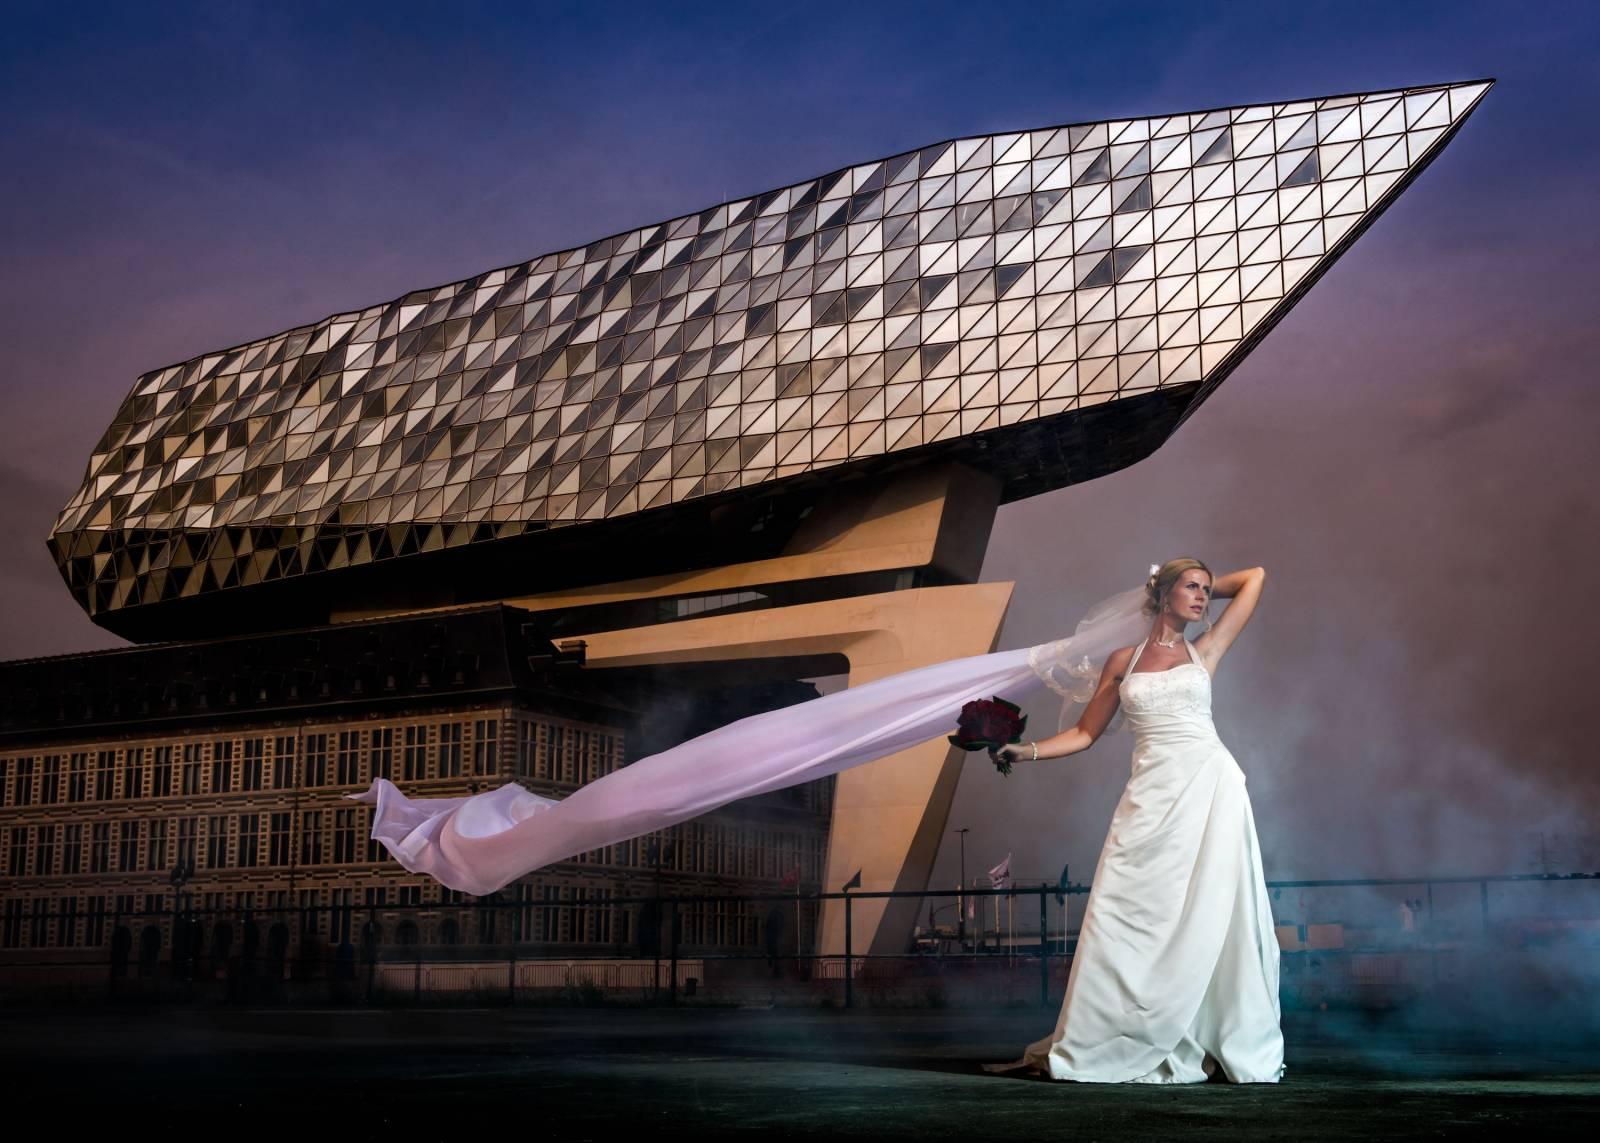 Foto Meeuw - House of Weddings - 32